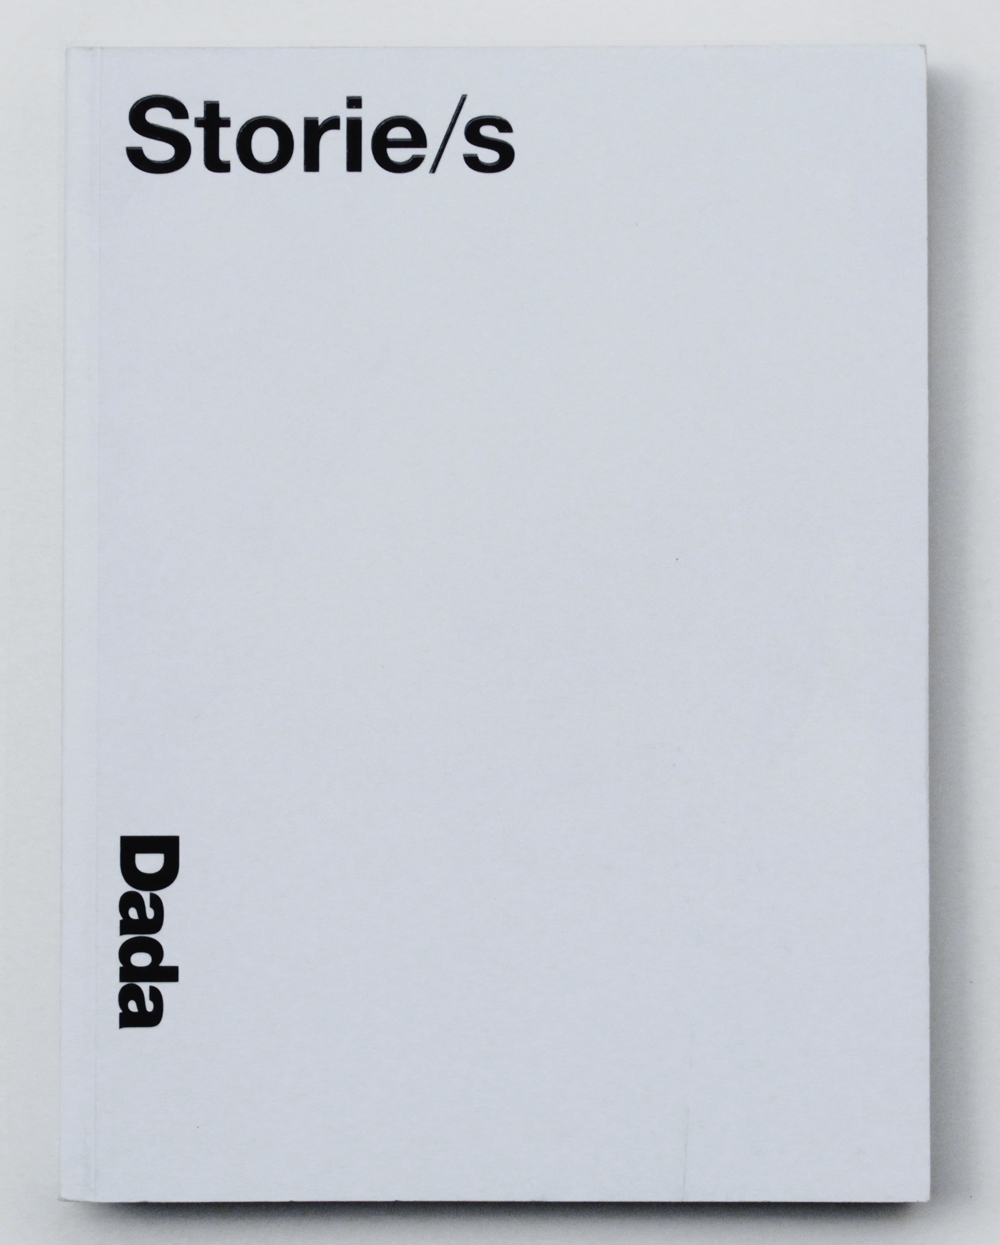 01_Dada stories_Silvia Fanticelli